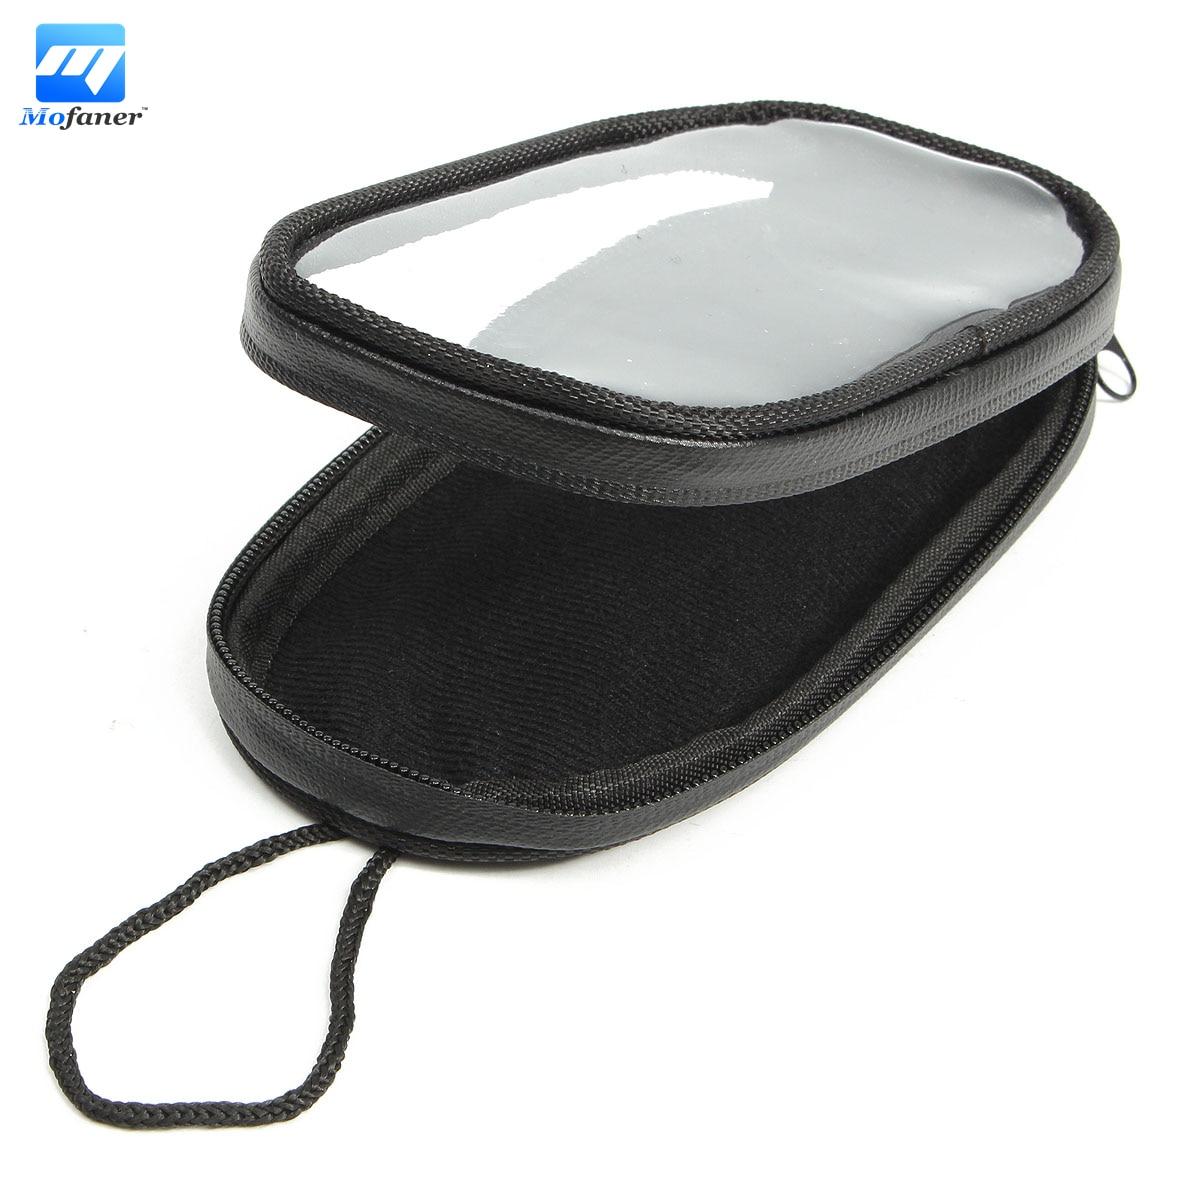 все цены на 1pc Black Motorbike Oil Tank Bag Motorcycle Waterproof Bag Screen Touch Navigation Bags онлайн